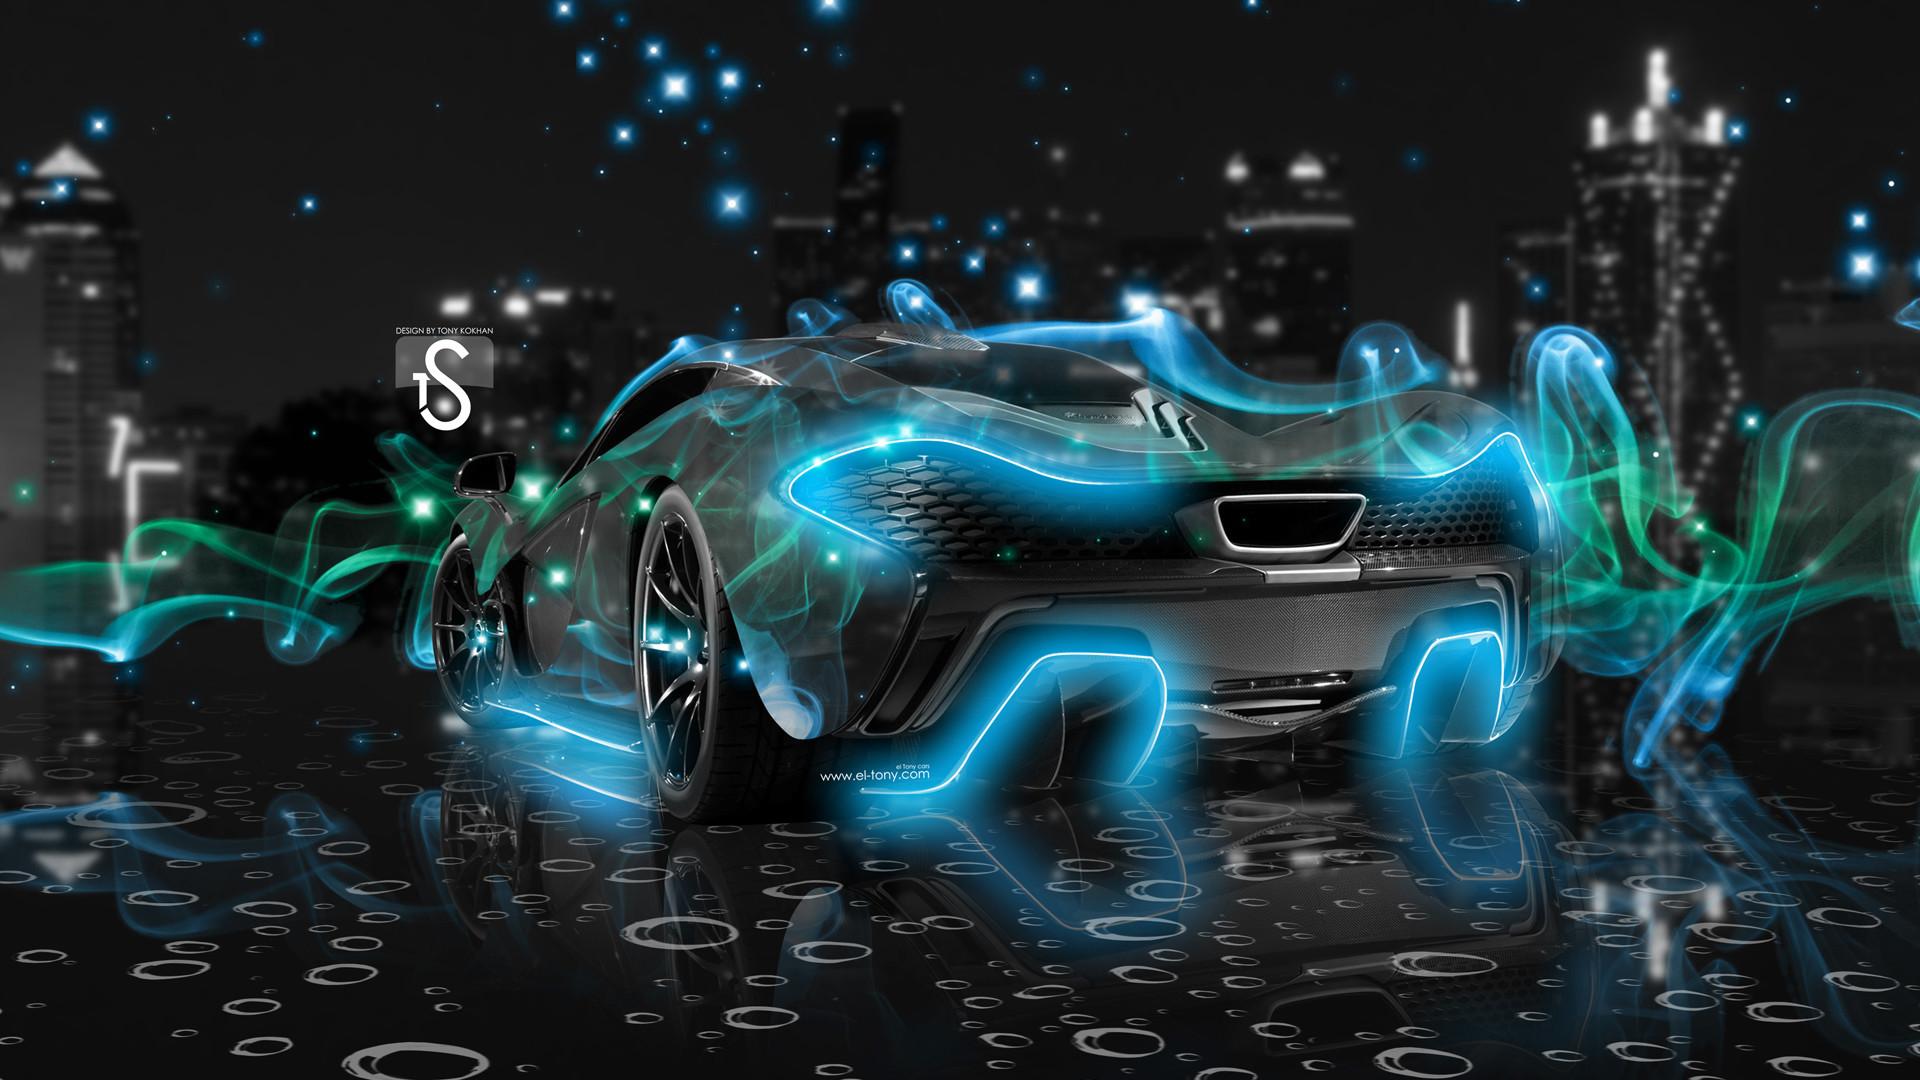 Cool Car Pictures Mclaren P1 Mclaren P1 Blue Smoke Crystal Wallpaper